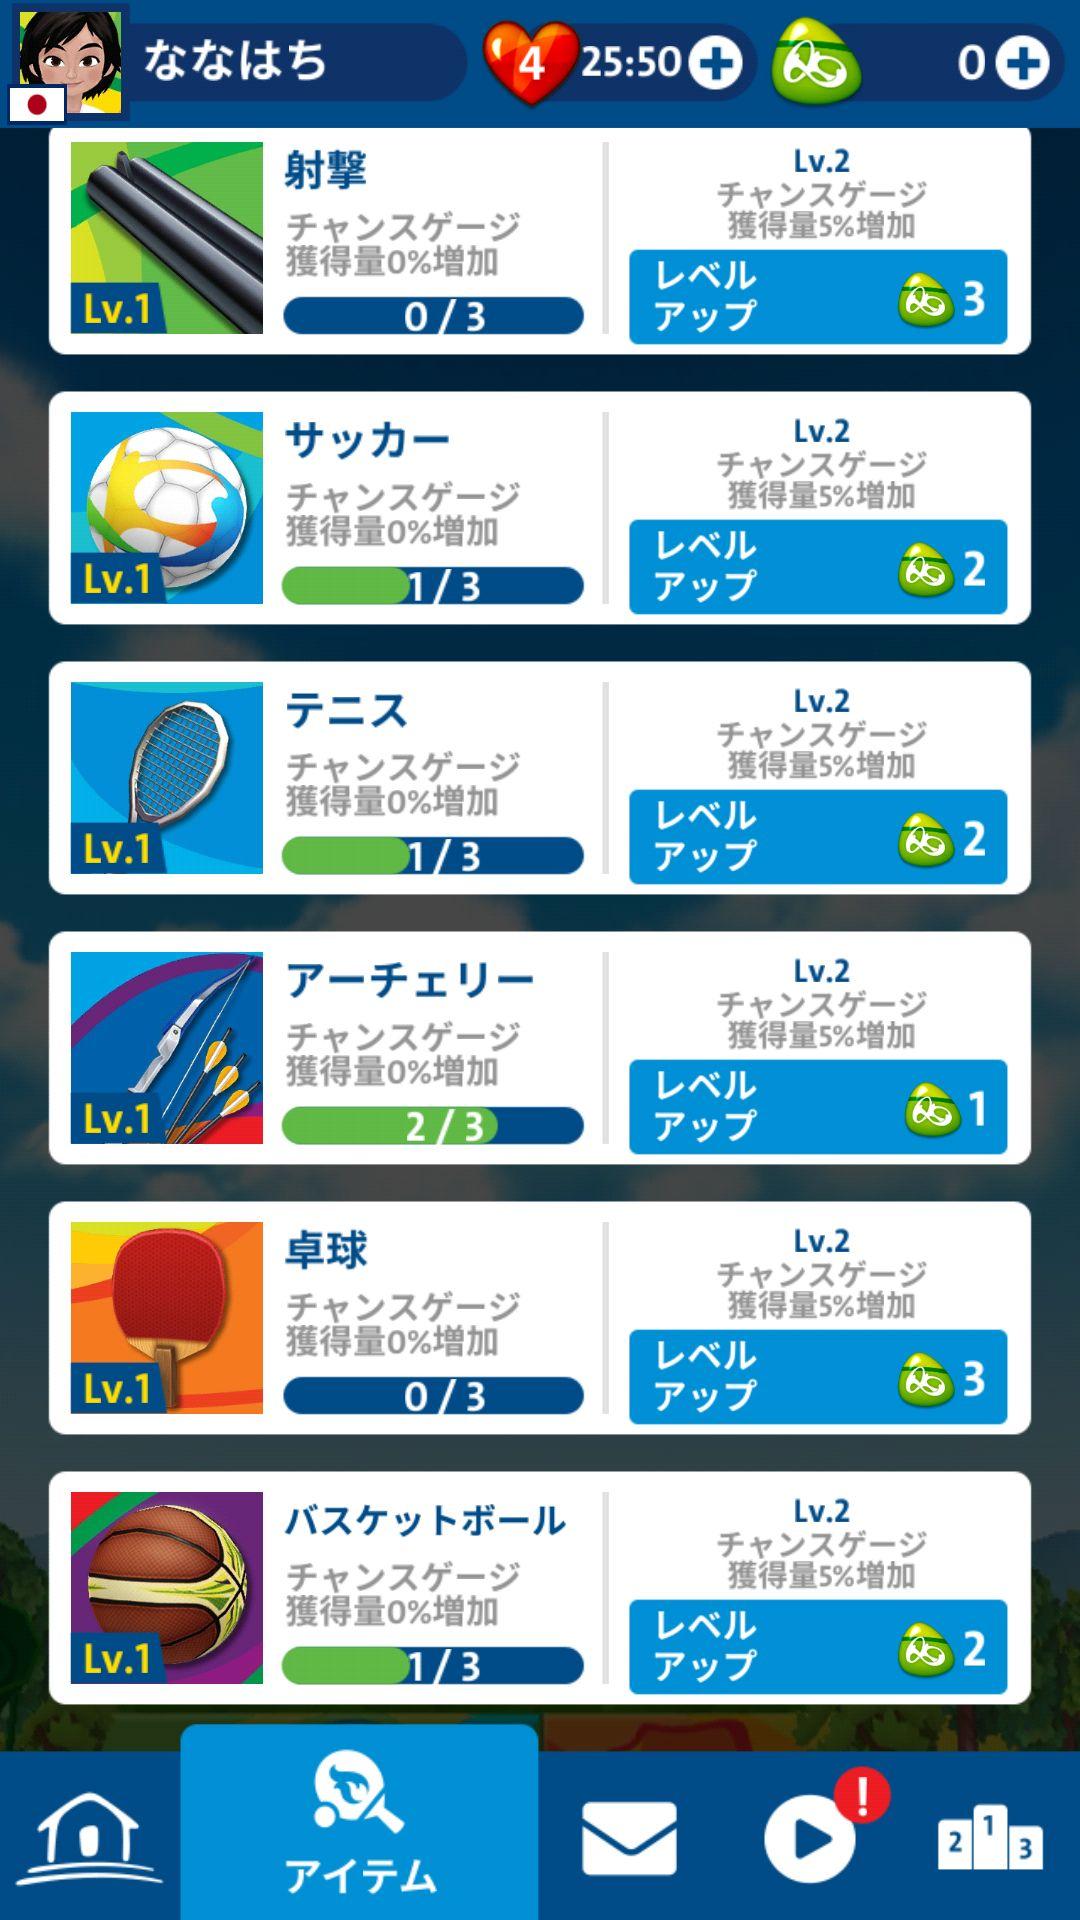 androidアプリ リオ2016オリンピック ゲームズ攻略スクリーンショット5